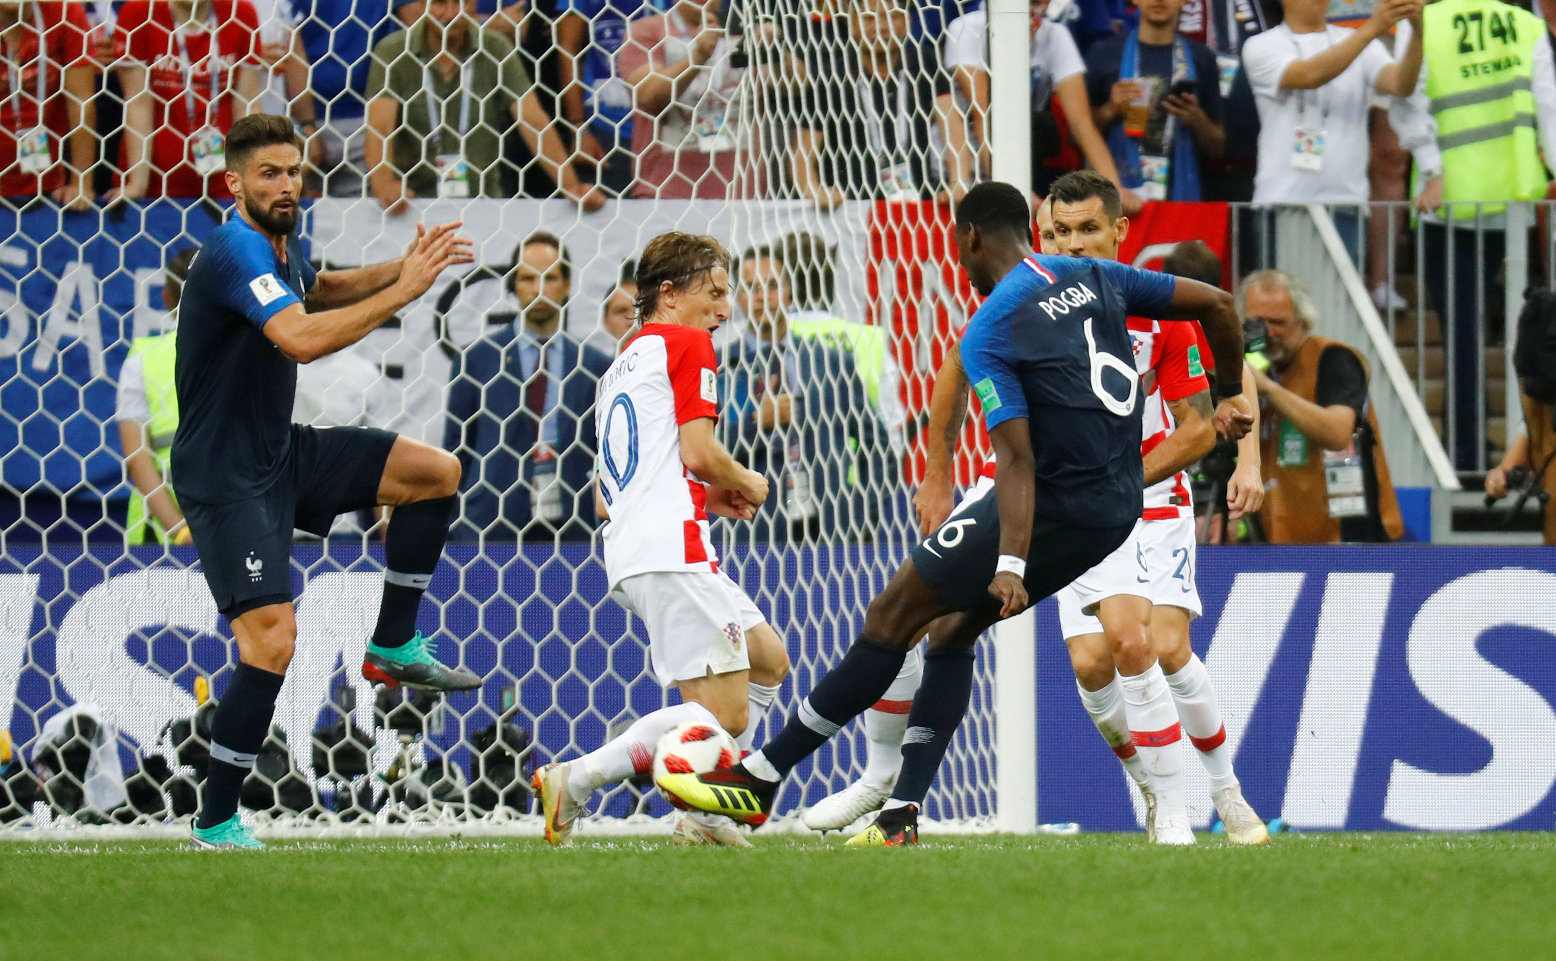 Soccer Football - World Cup - Final - France v Croatia - Luzhniki Stadium, Moscow, Russia - July 15, 2018  France's Paul Pogba scores their third goal   REUTERS/Kai Pfaffenbach